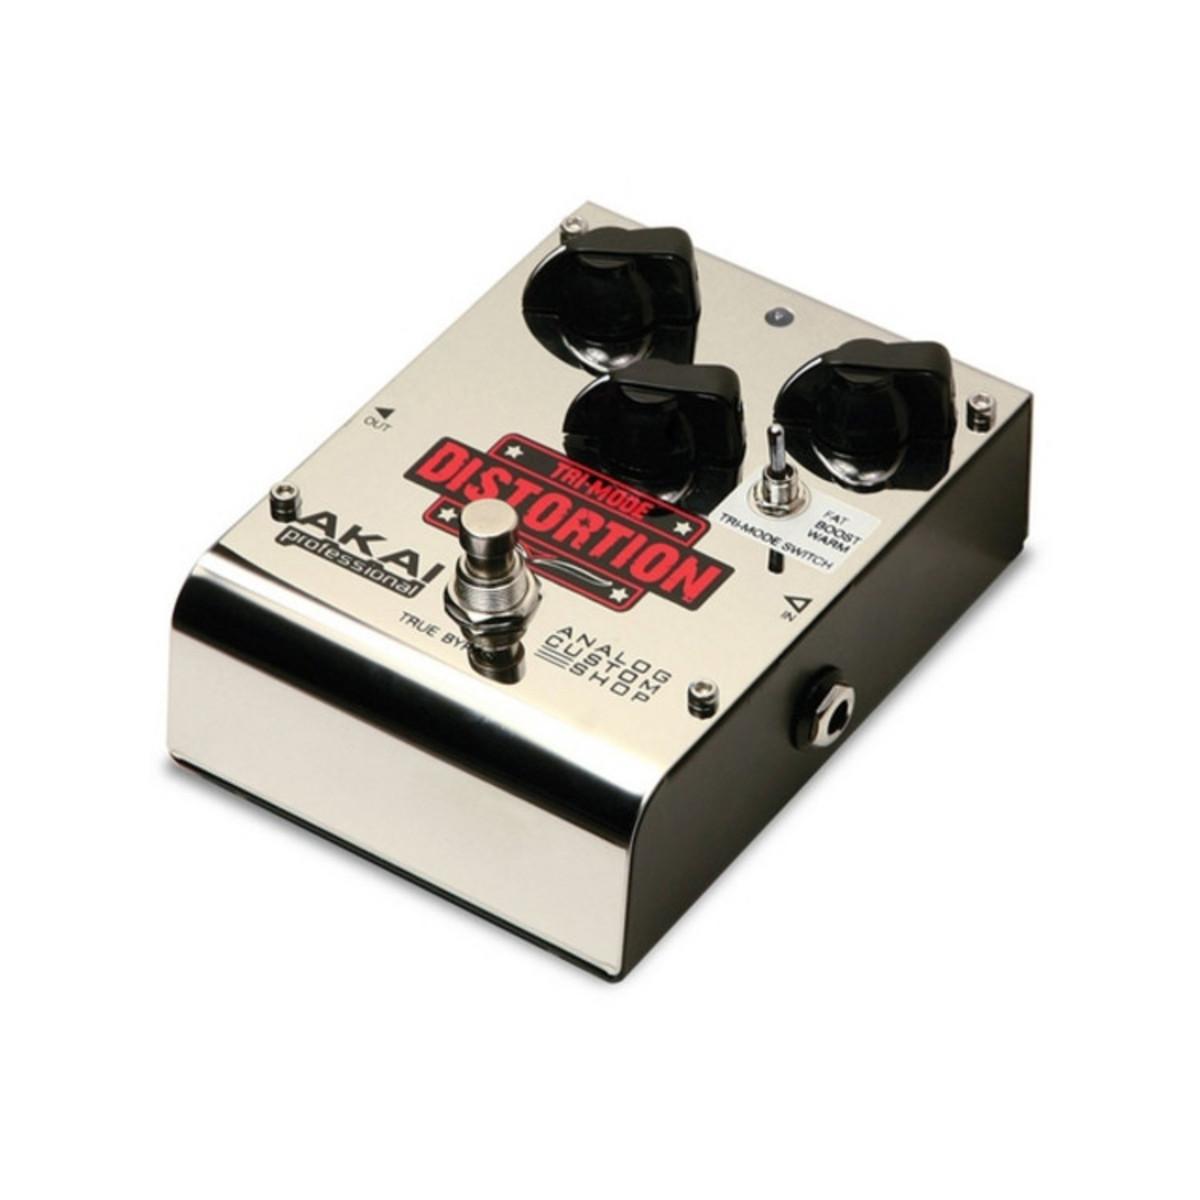 Akai Tri-Mode Distortion Guitar Effect Pedal at Gear4music.com